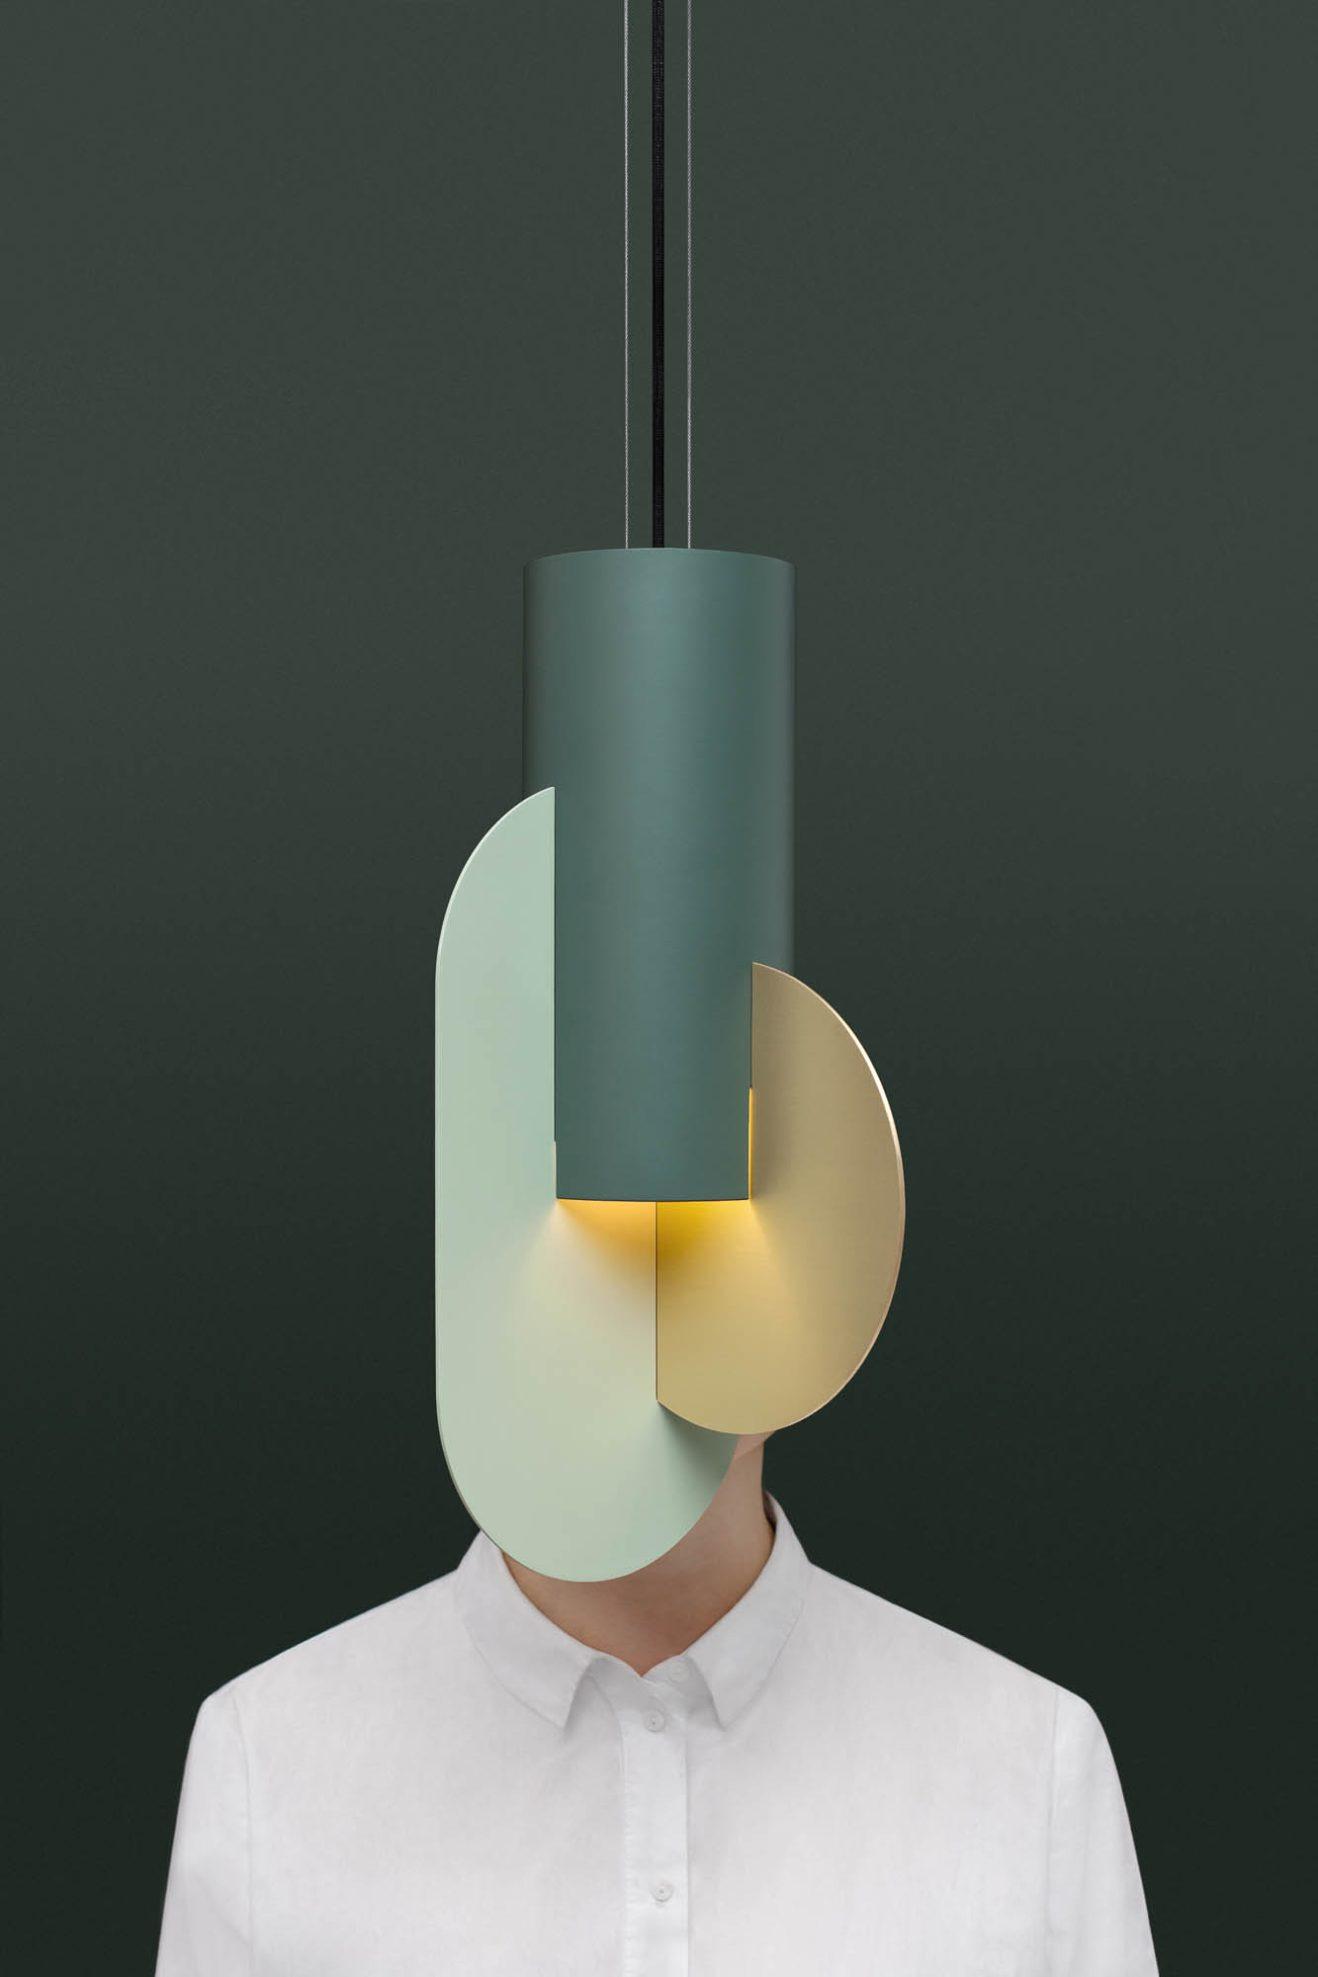 Noom-Suprematic-Lamp-CS5-18